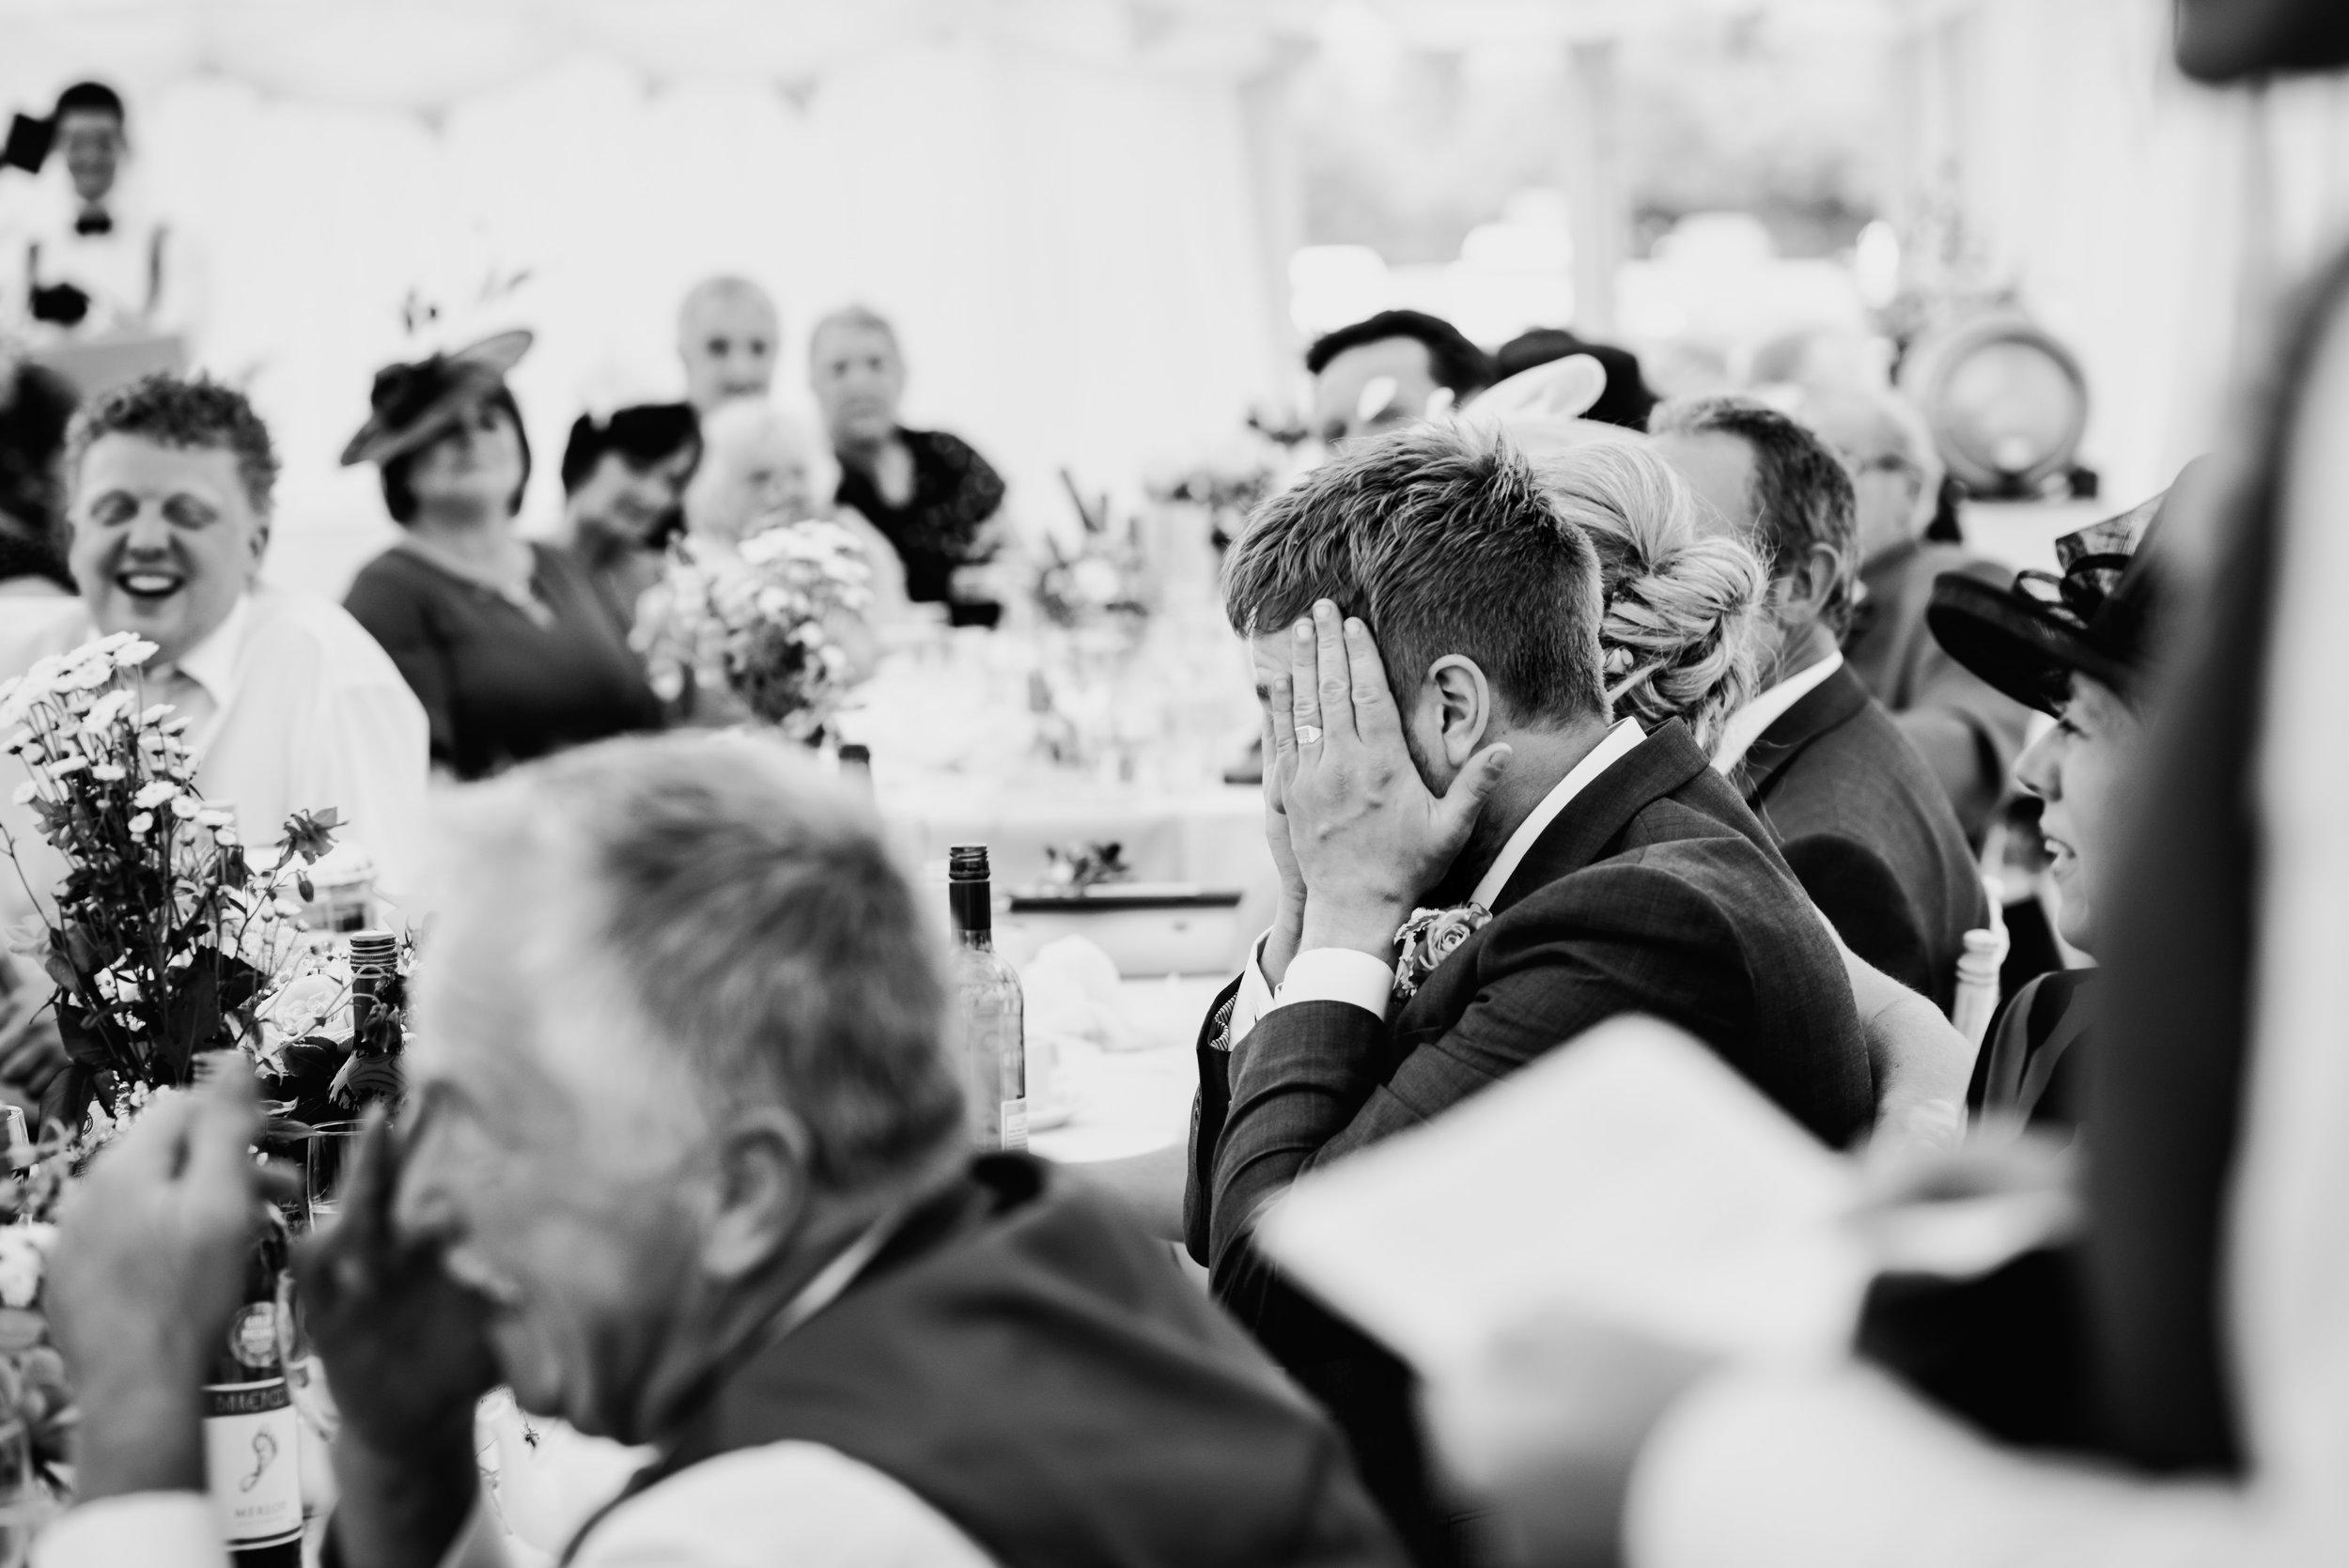 bw photo - embarrassed groom